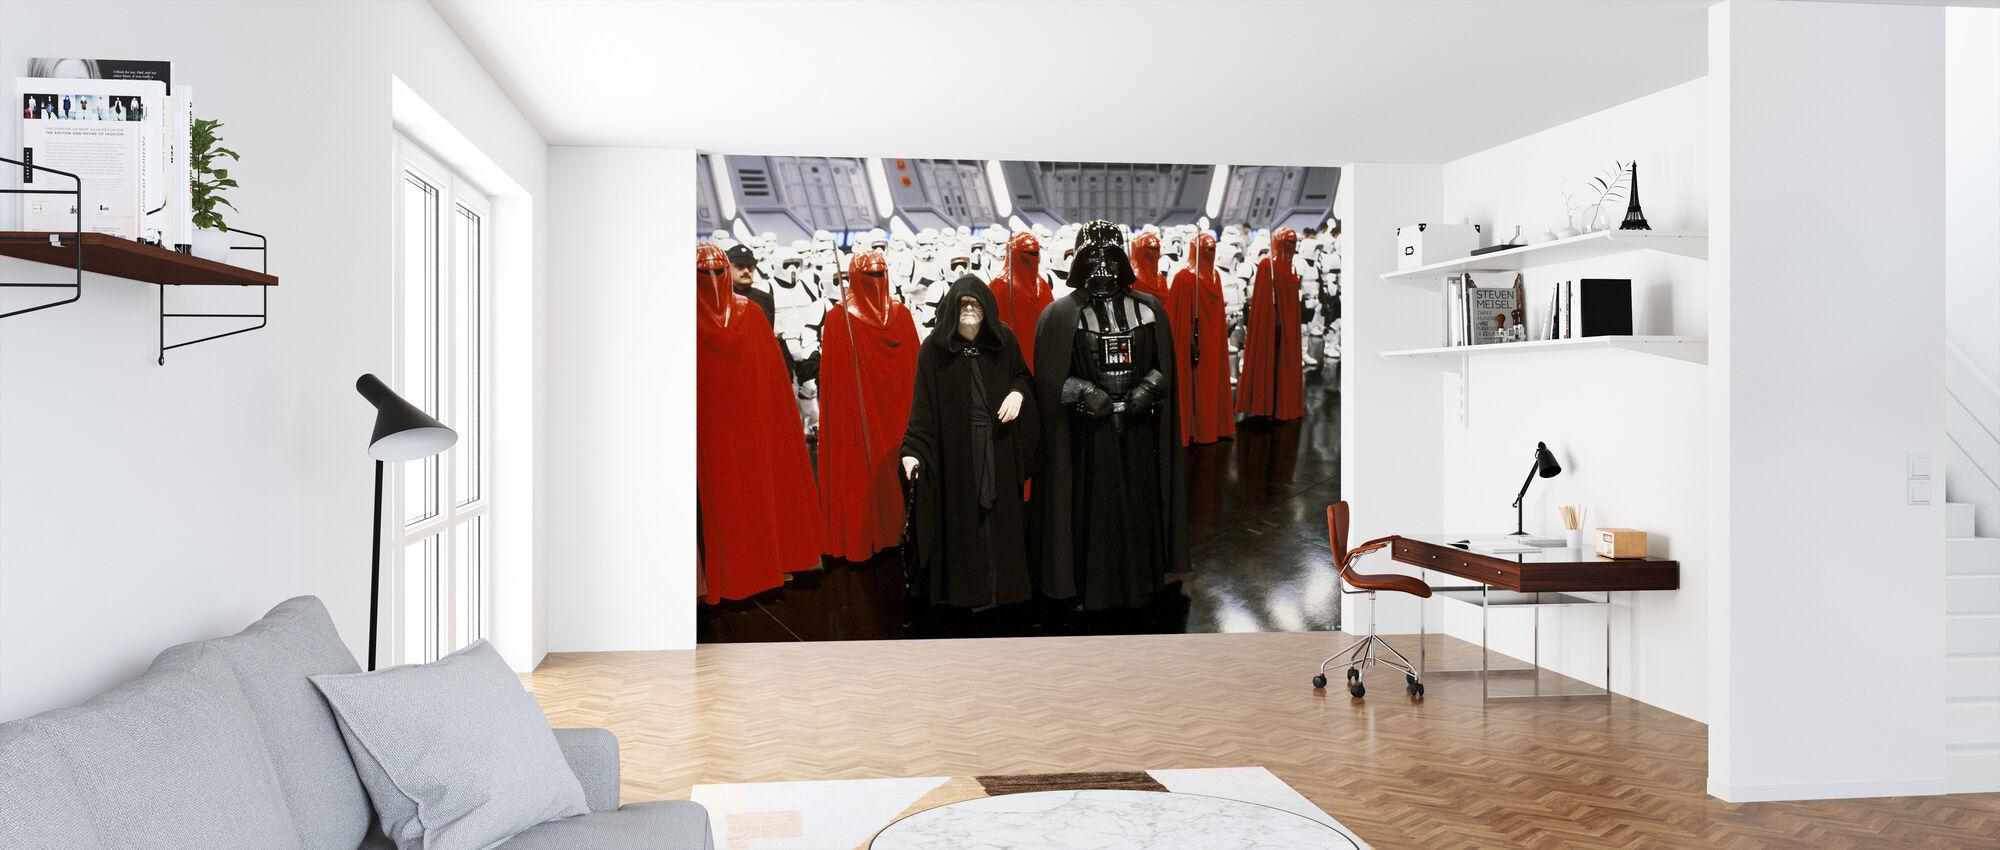 Stjärnornas krig - kejserliga soldater - Tapet - Kontor